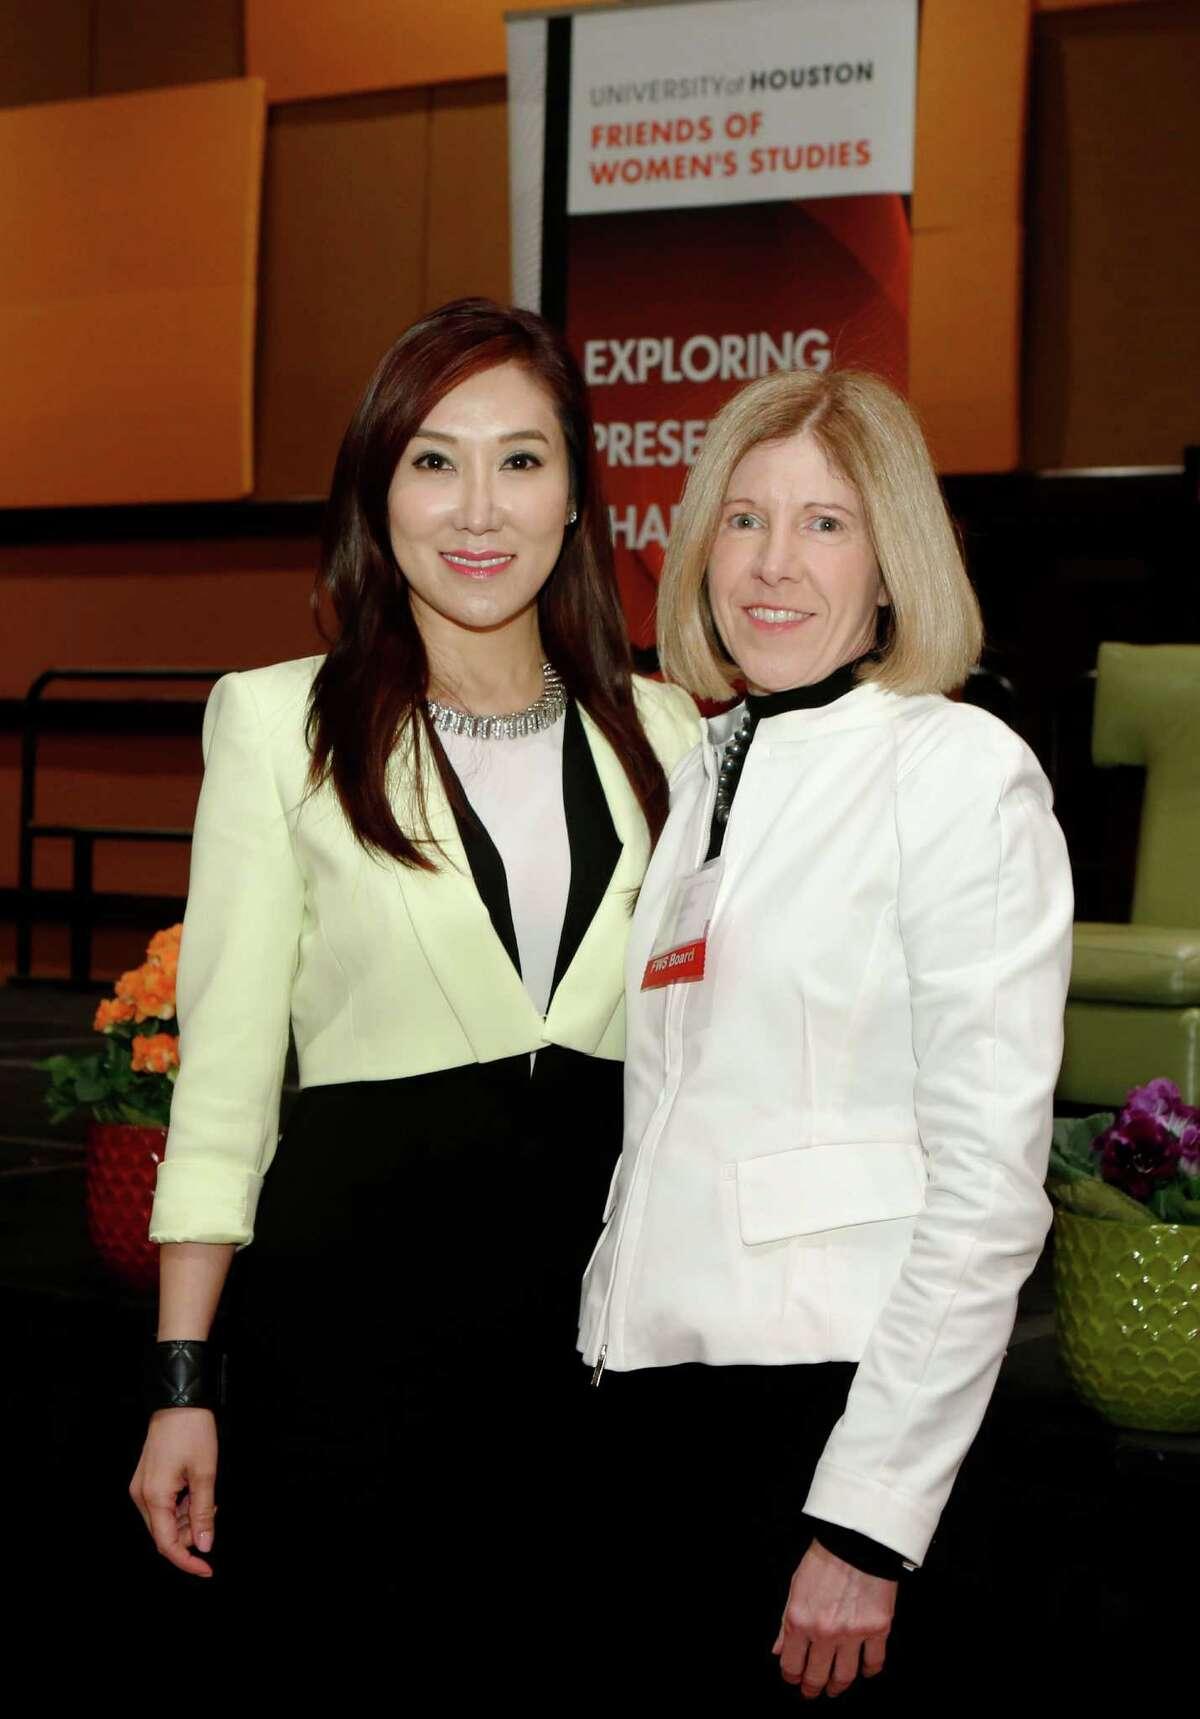 Mandy Kao, left, and Caroline Fant